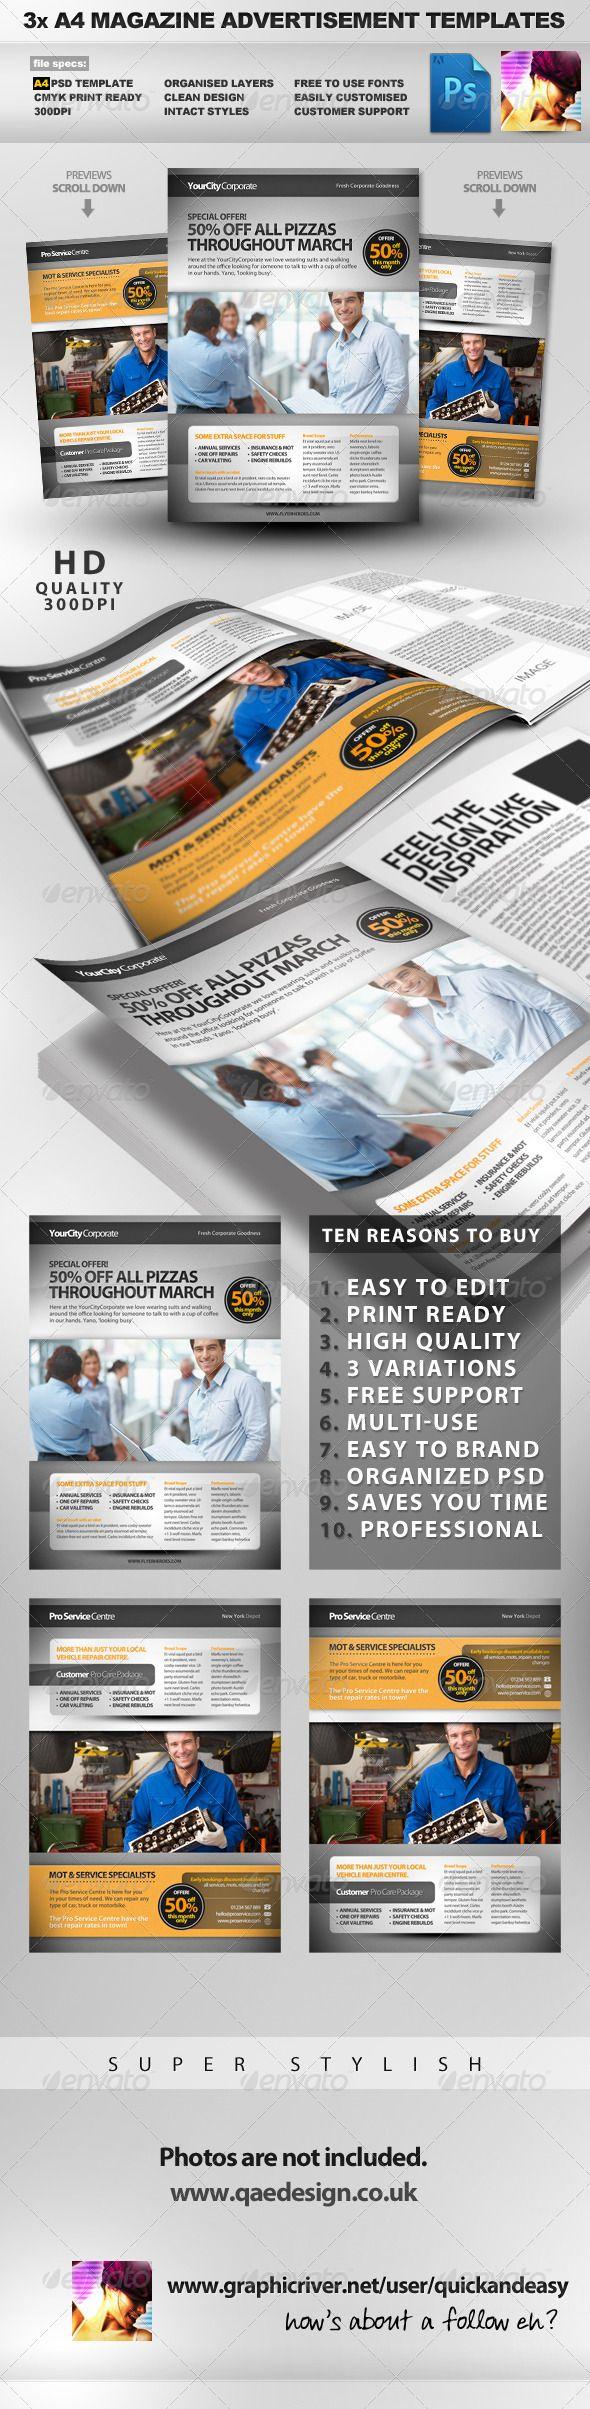 Pro Services A4 Magazine Advertisement Templates 2  #GraphicRiver                   A4